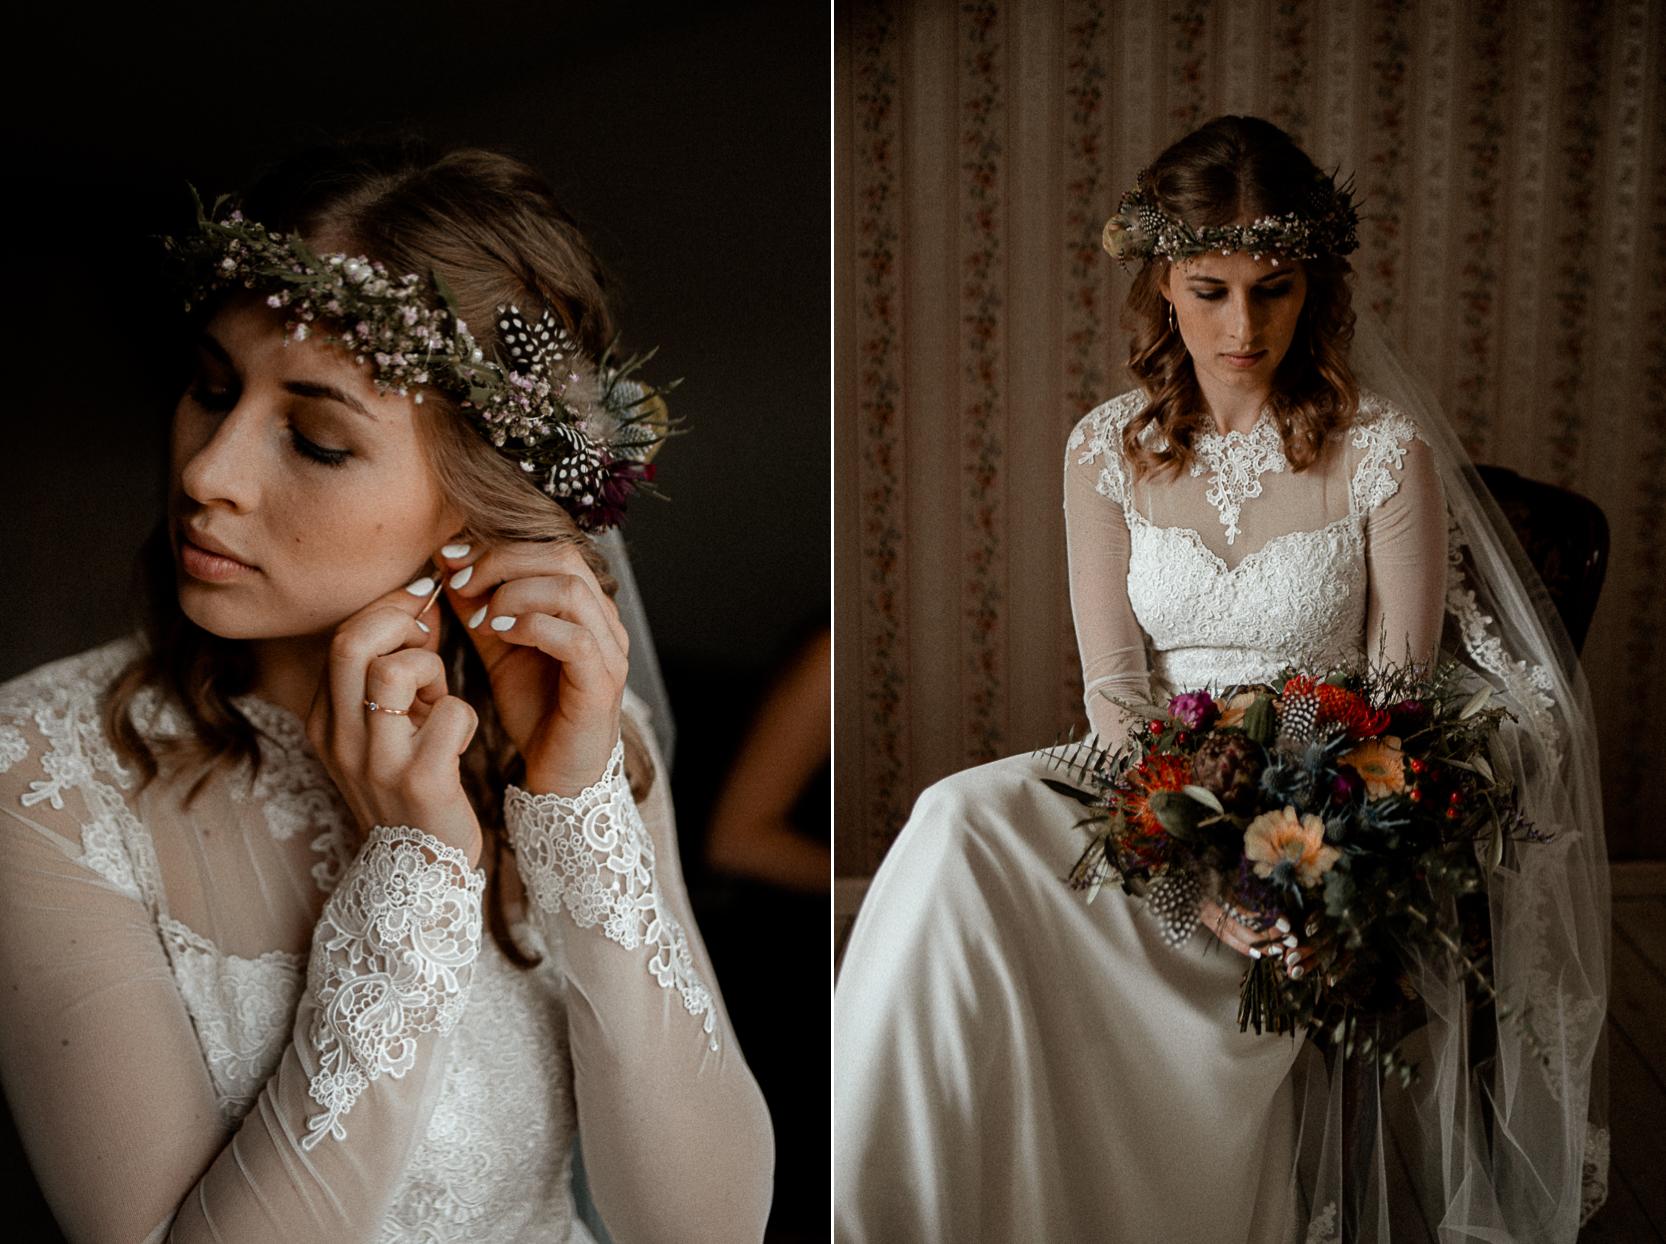 wholeheartedweddings-TimoMatthies-weddingphotography-moody-Melanie-Henrick-Mannheim-029.jpg